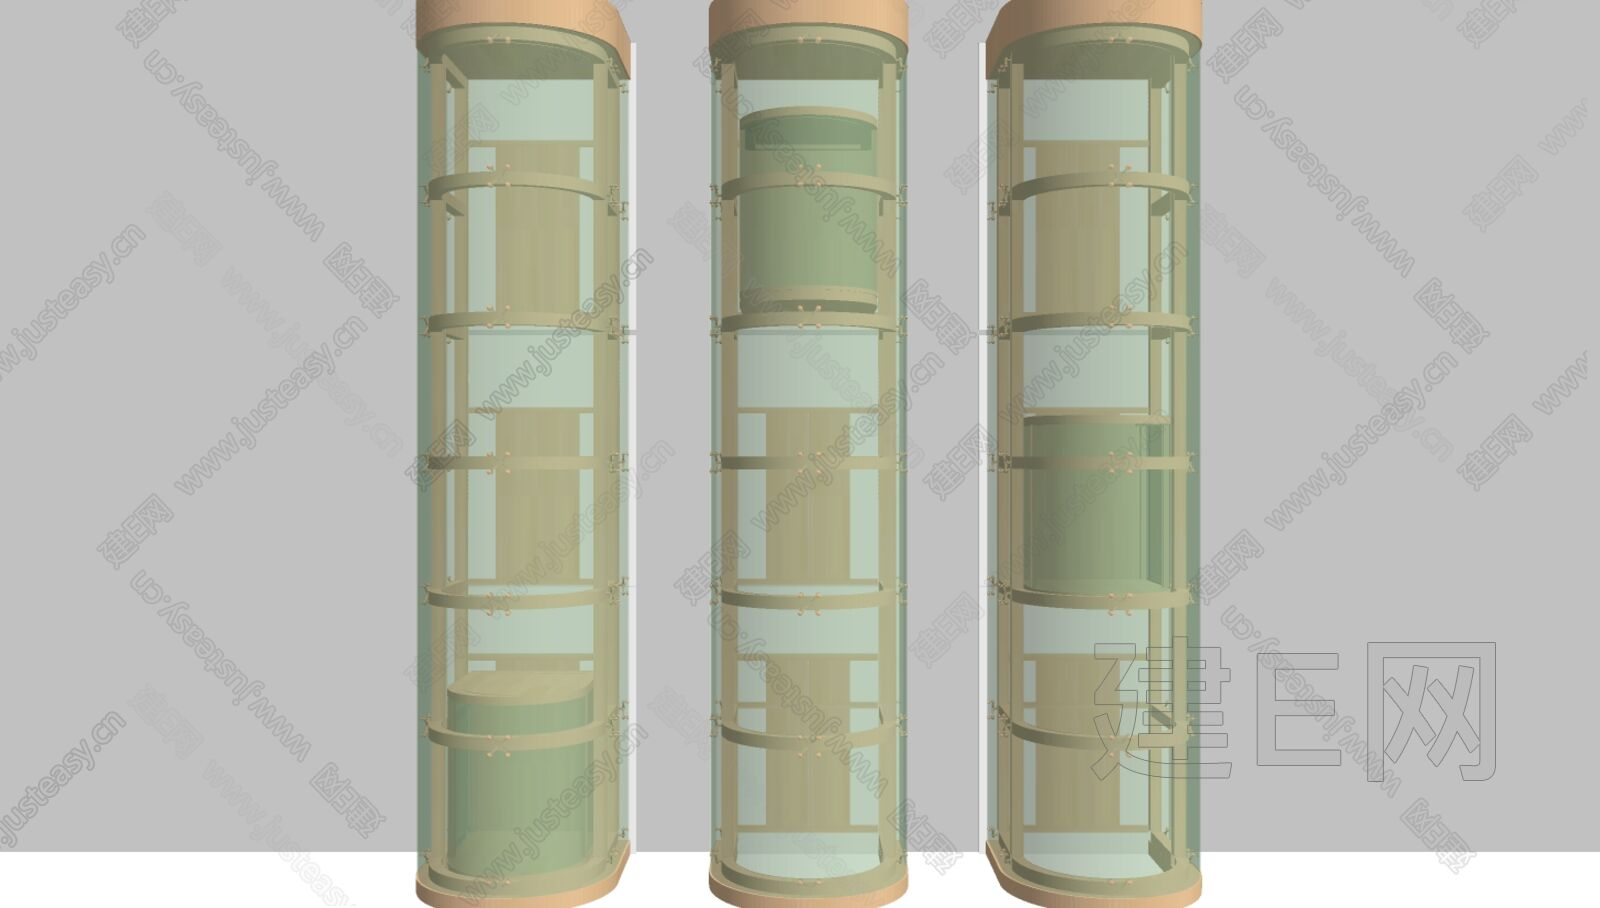 现代电梯门sketchup模型